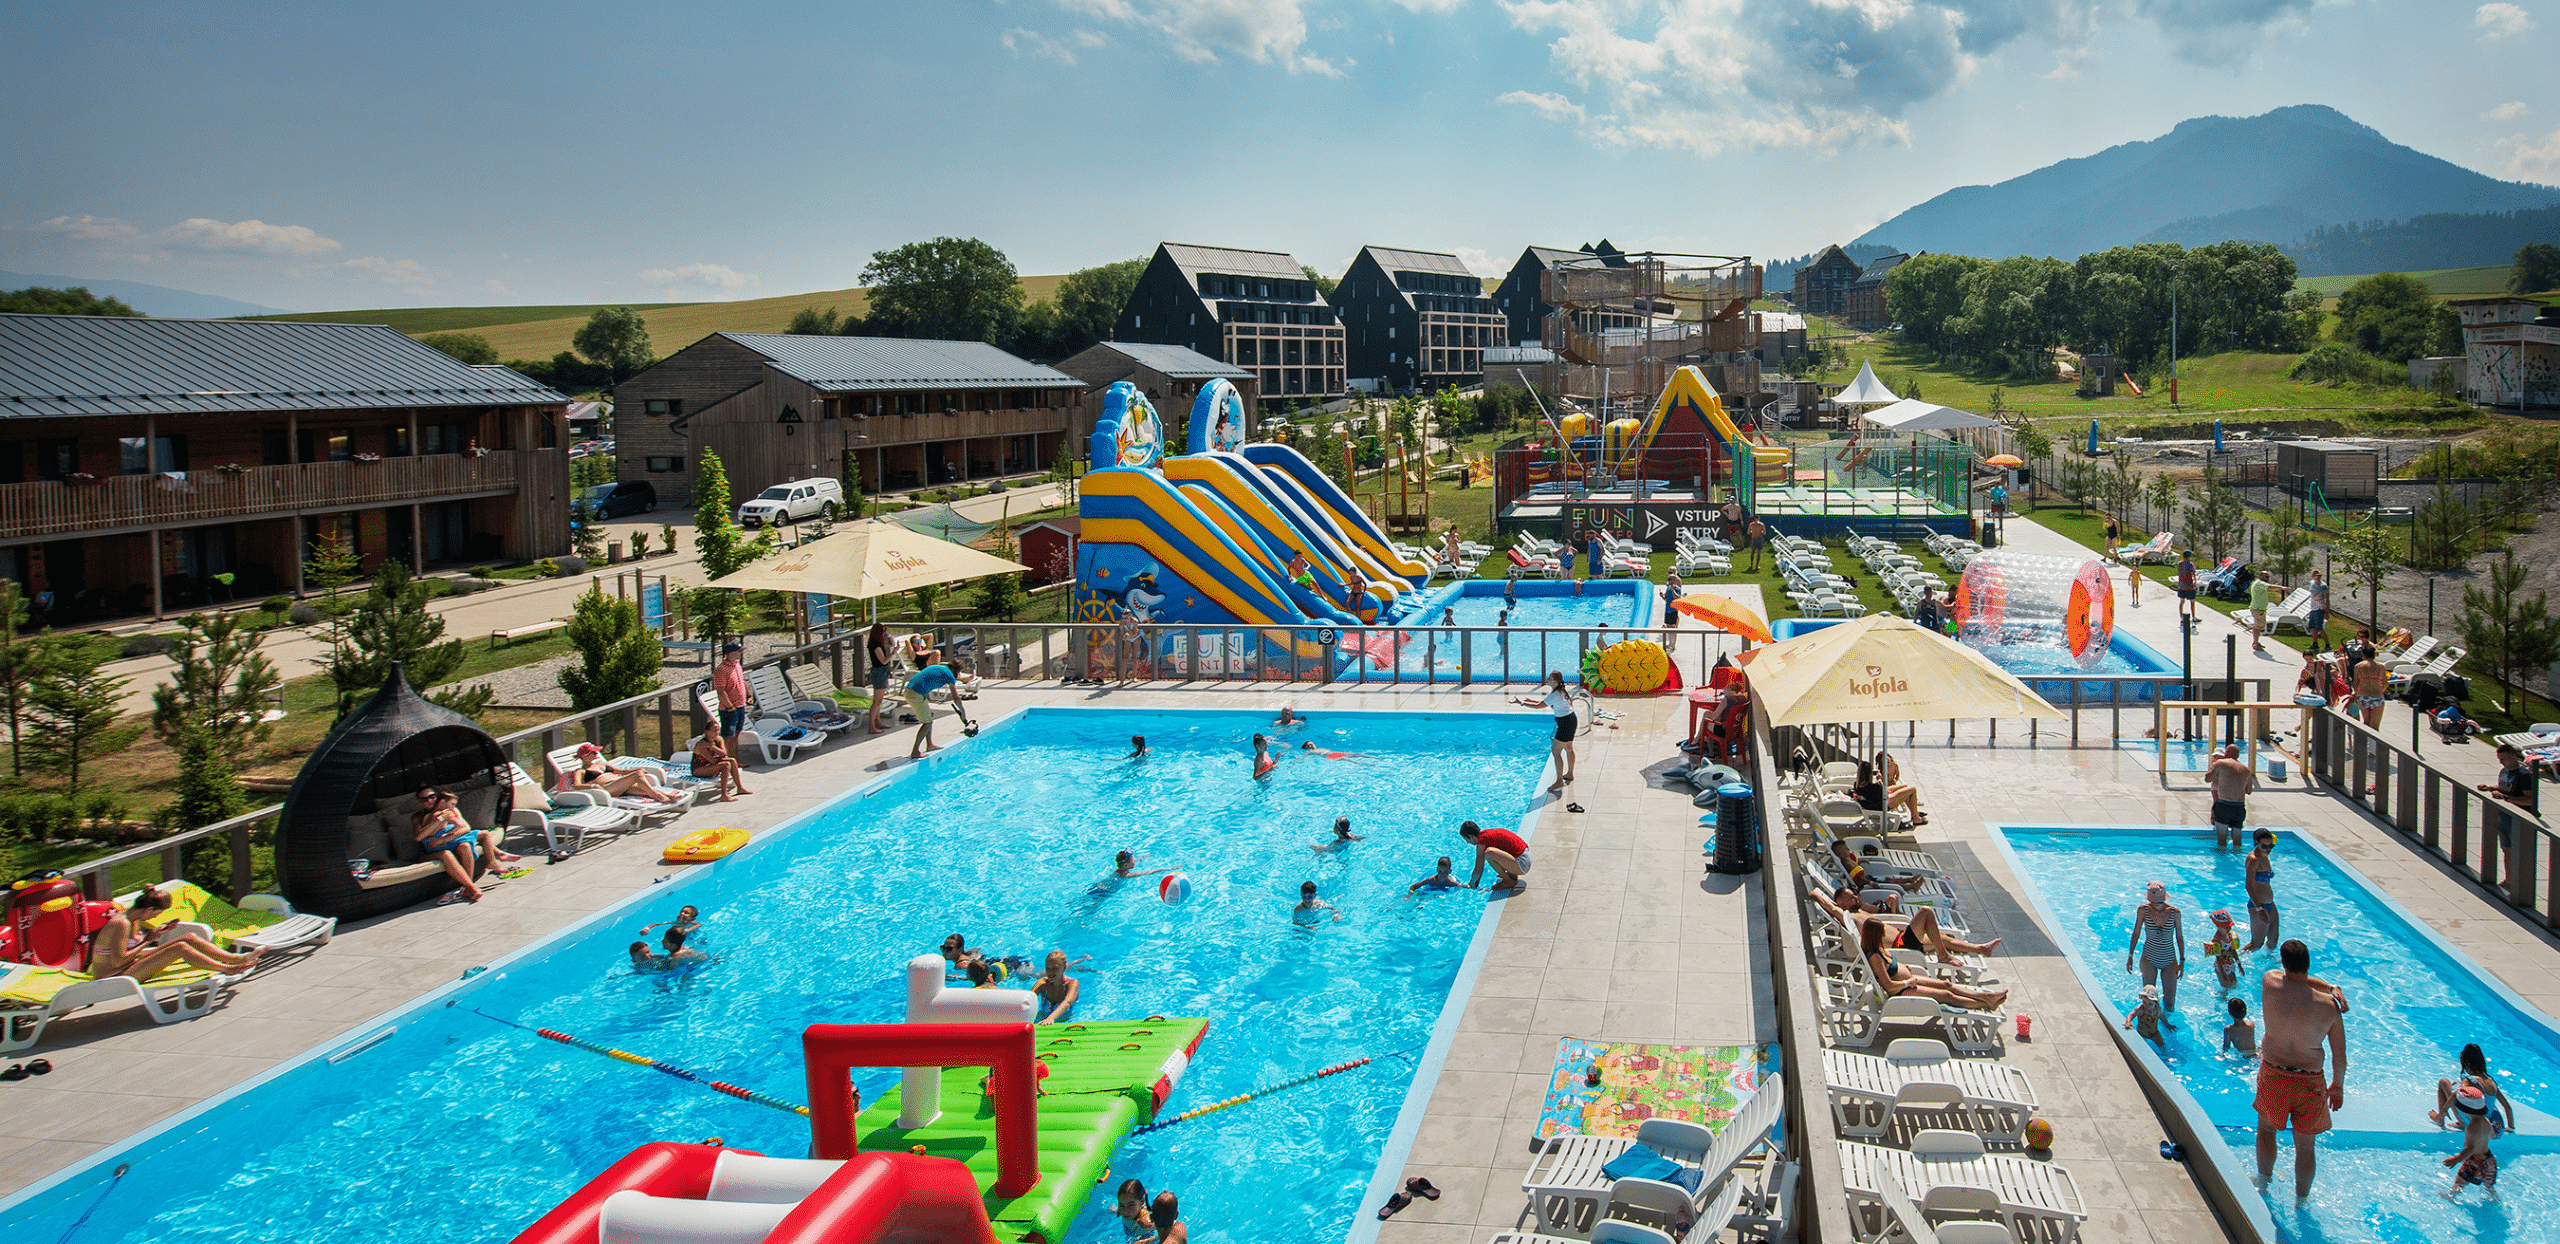 demanova-rezort-aquapark-home-page1